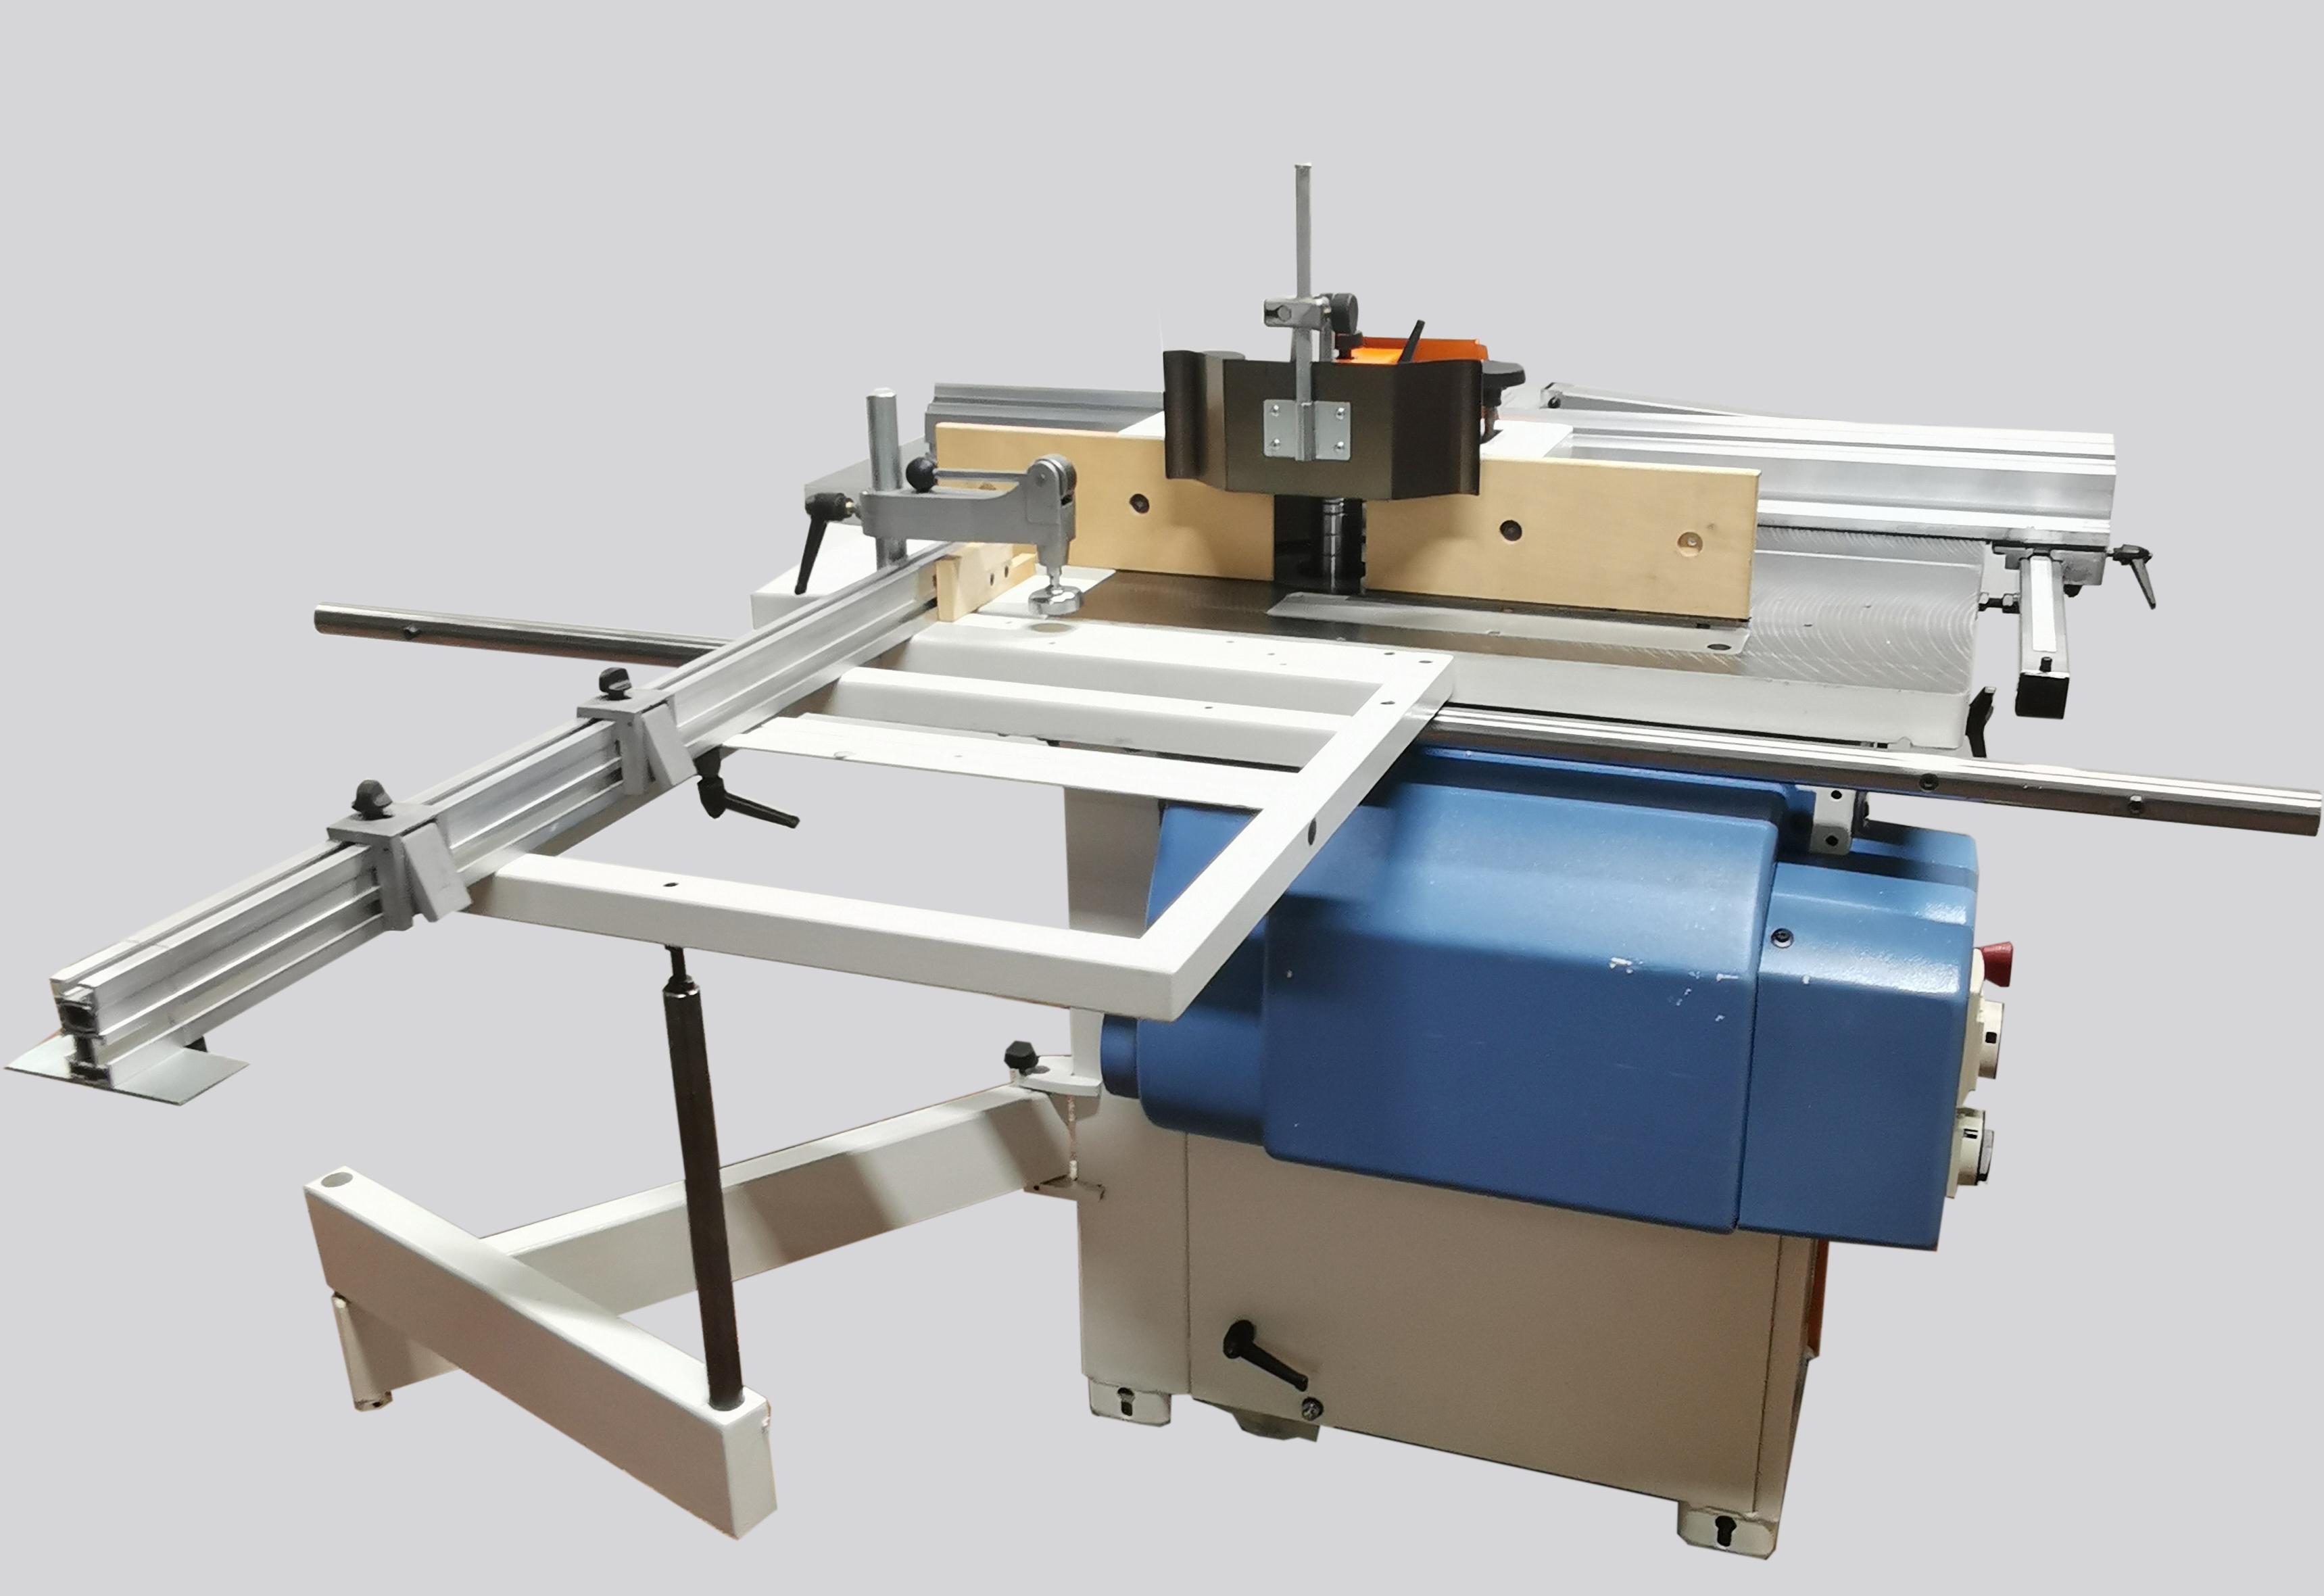 SCM Mini Max Lab 300 N universal woodworking machine, Saw, Spindle,